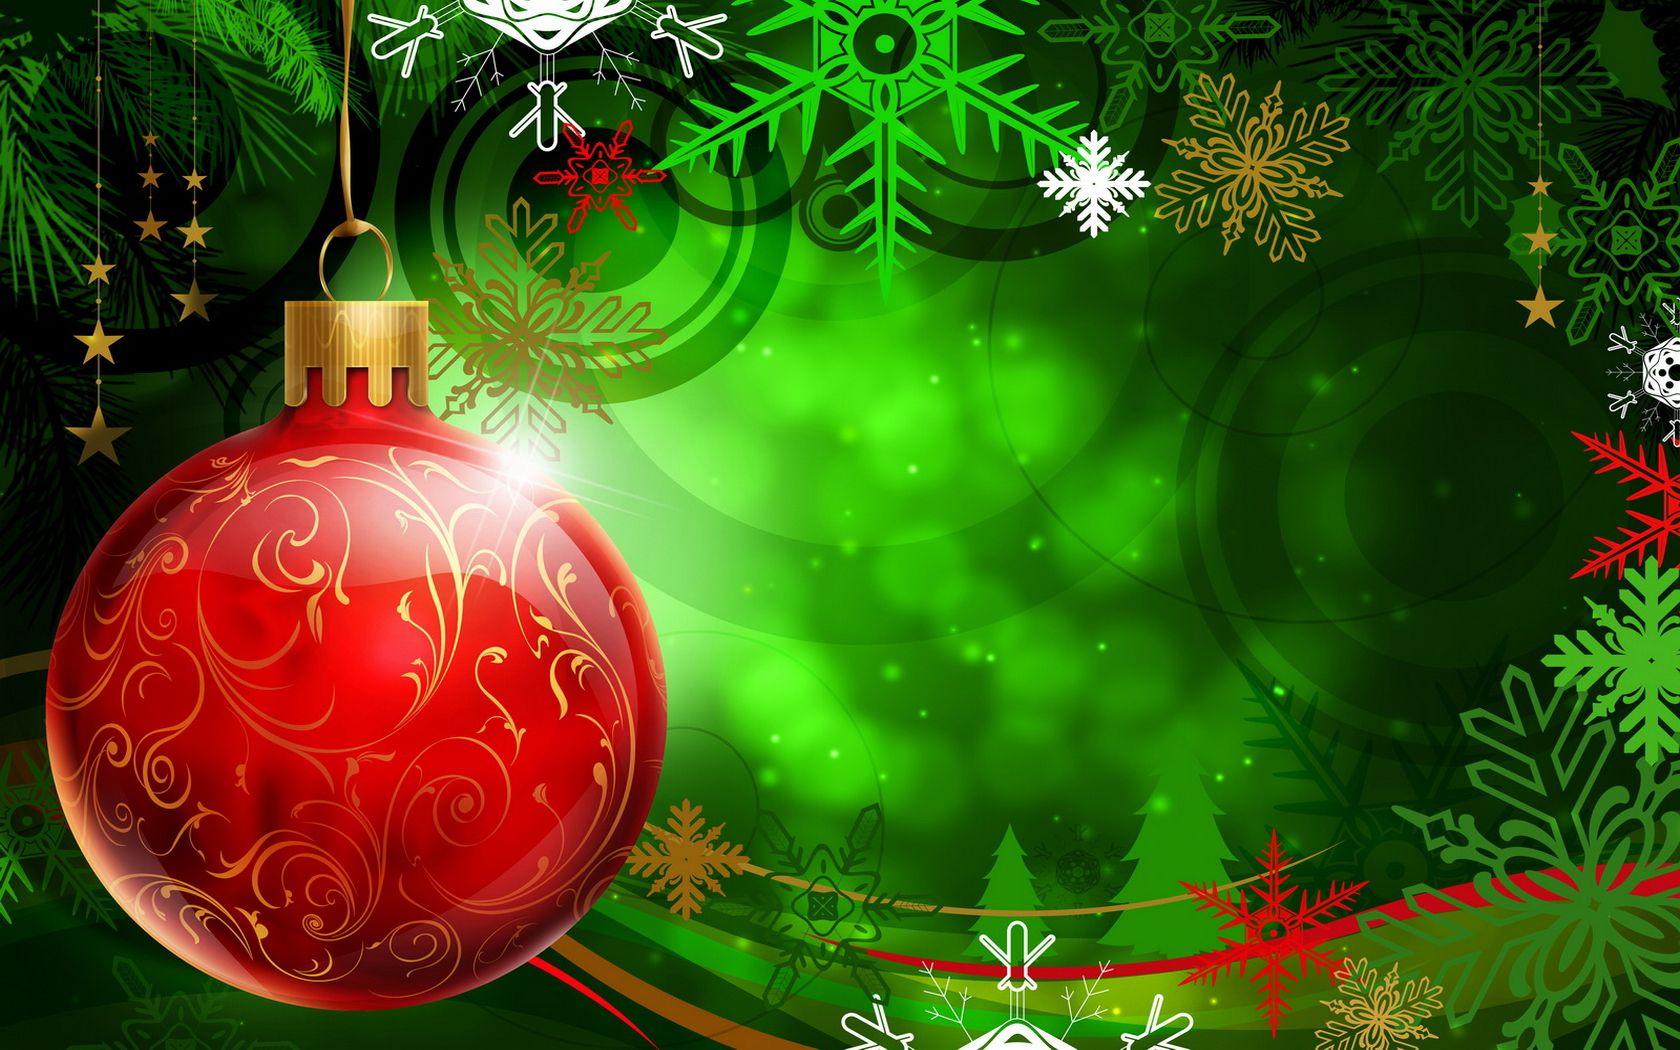 Free Animated Christmas Themes For Windows 10 Google Search Christmas Tree Wallpaper Christmas Background Desktop Christmas Wallpaper